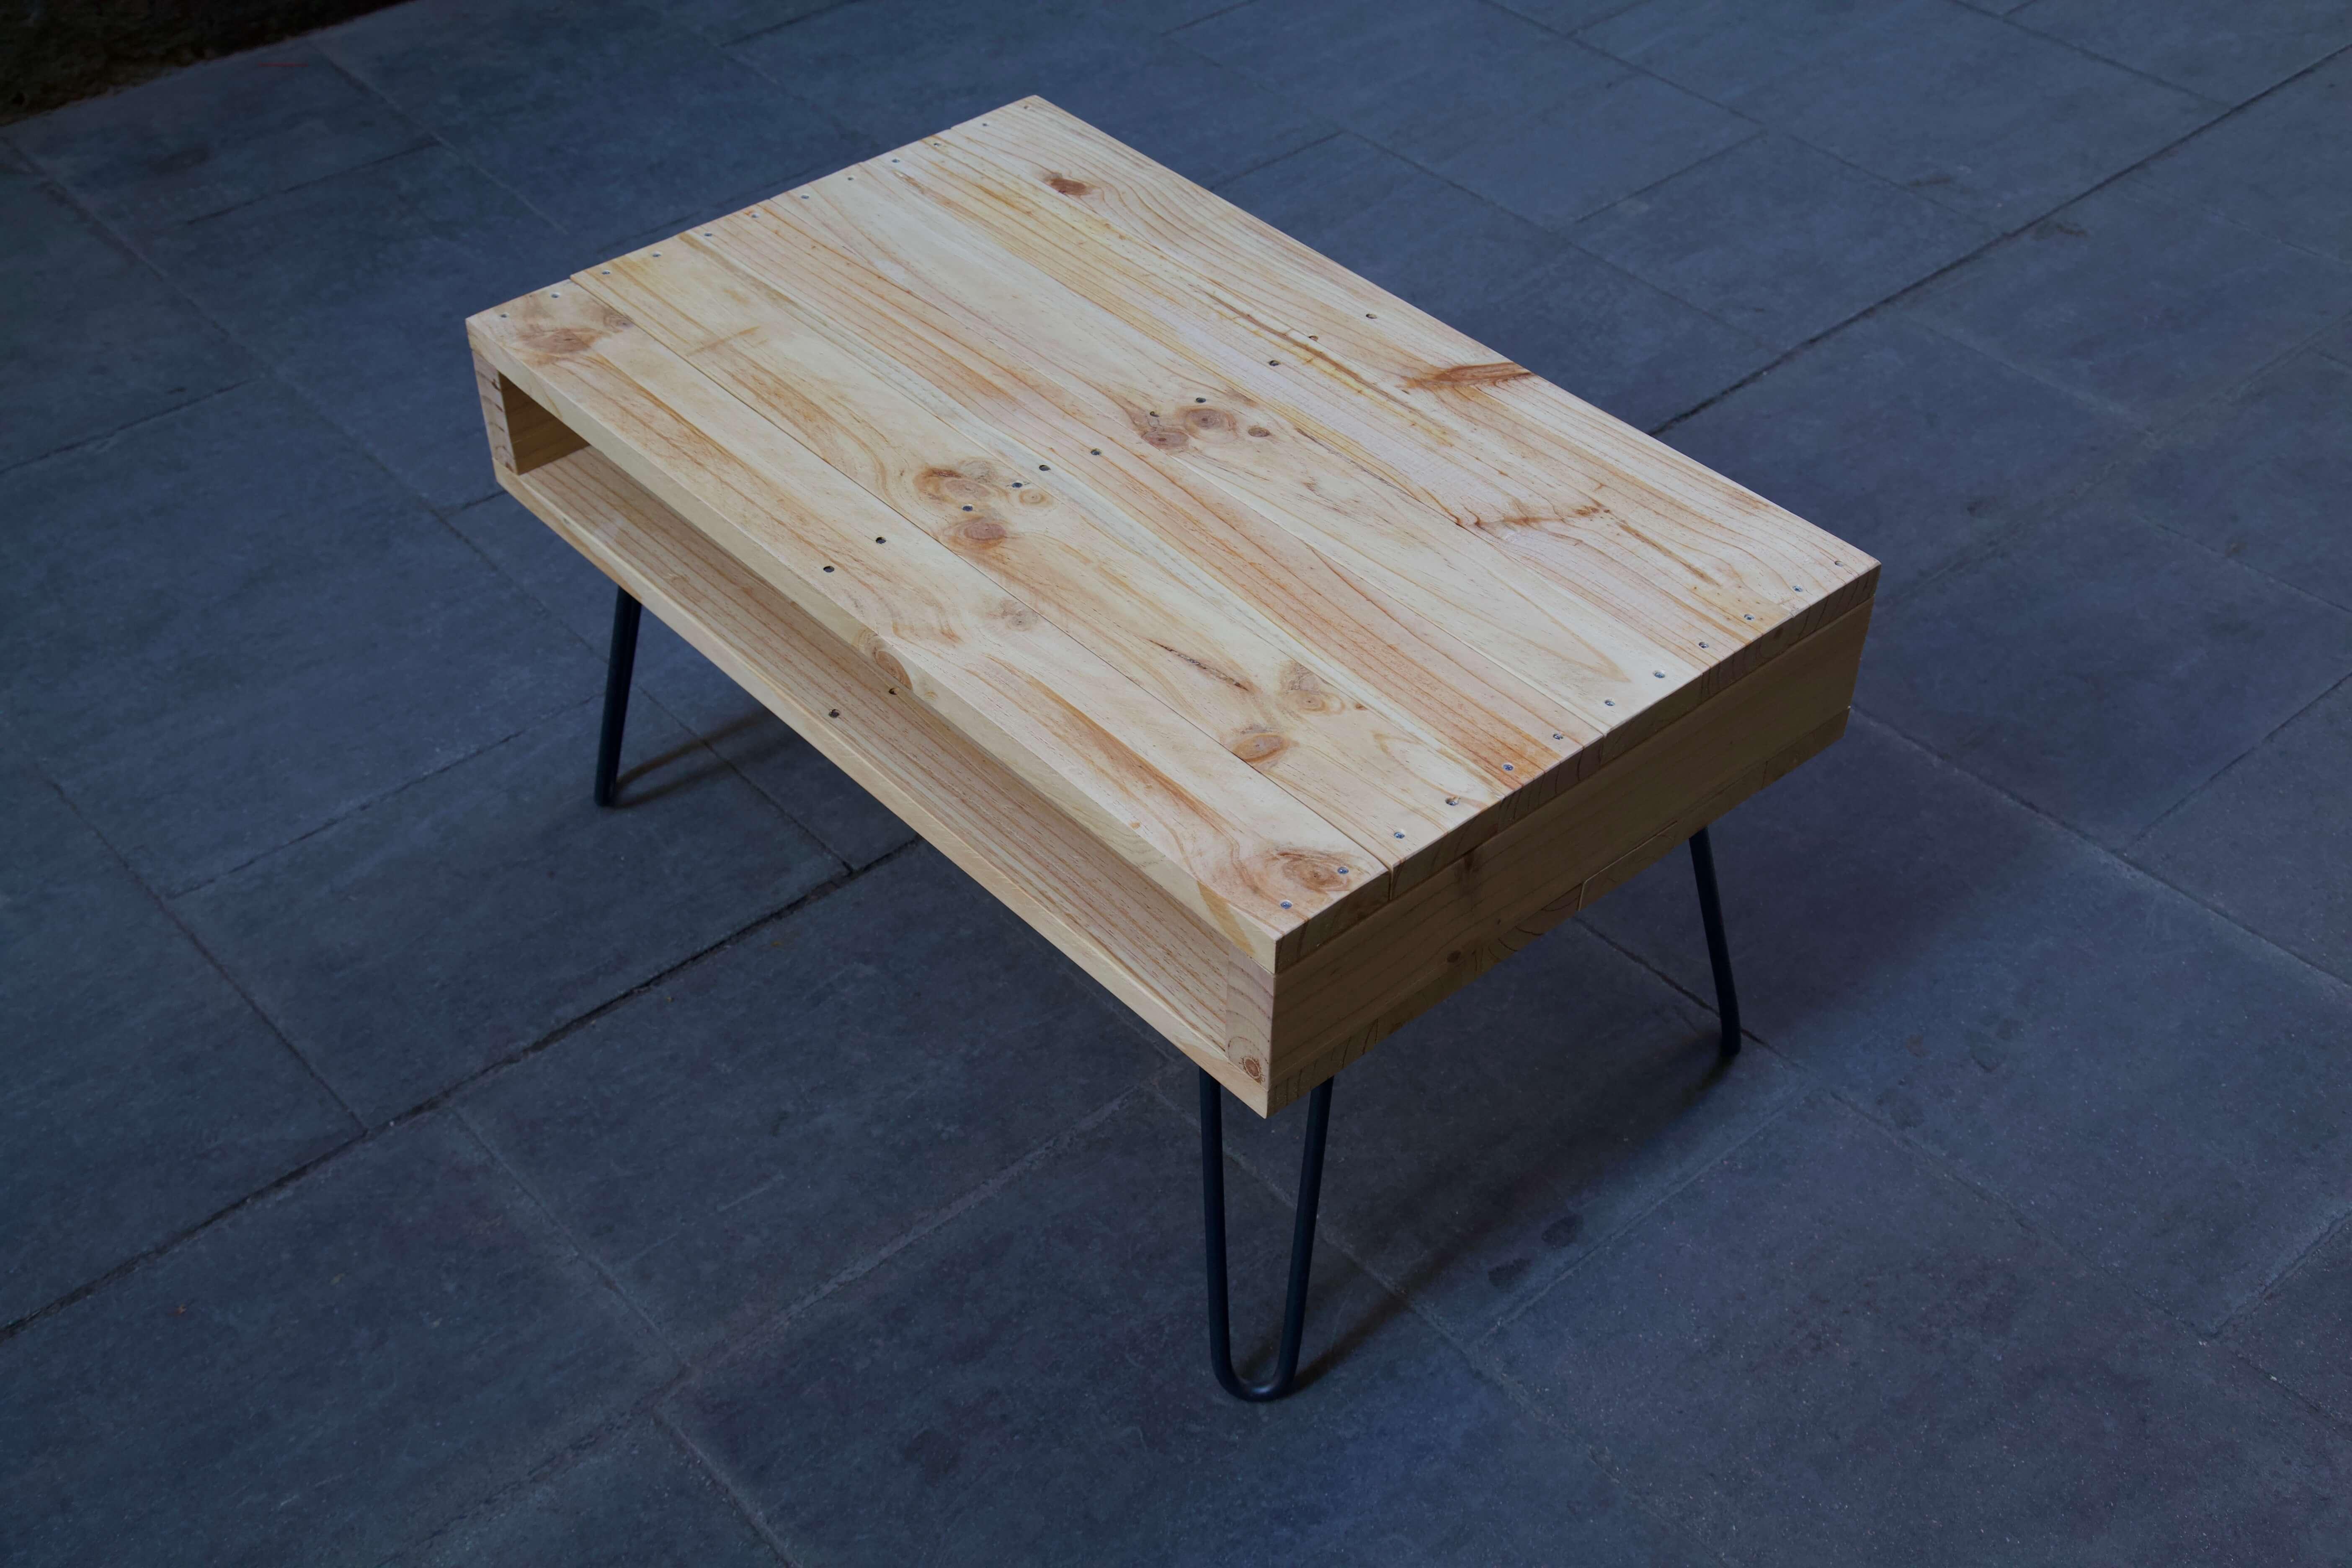 detalle cenital derecha de la mesa hecha con palets lexa